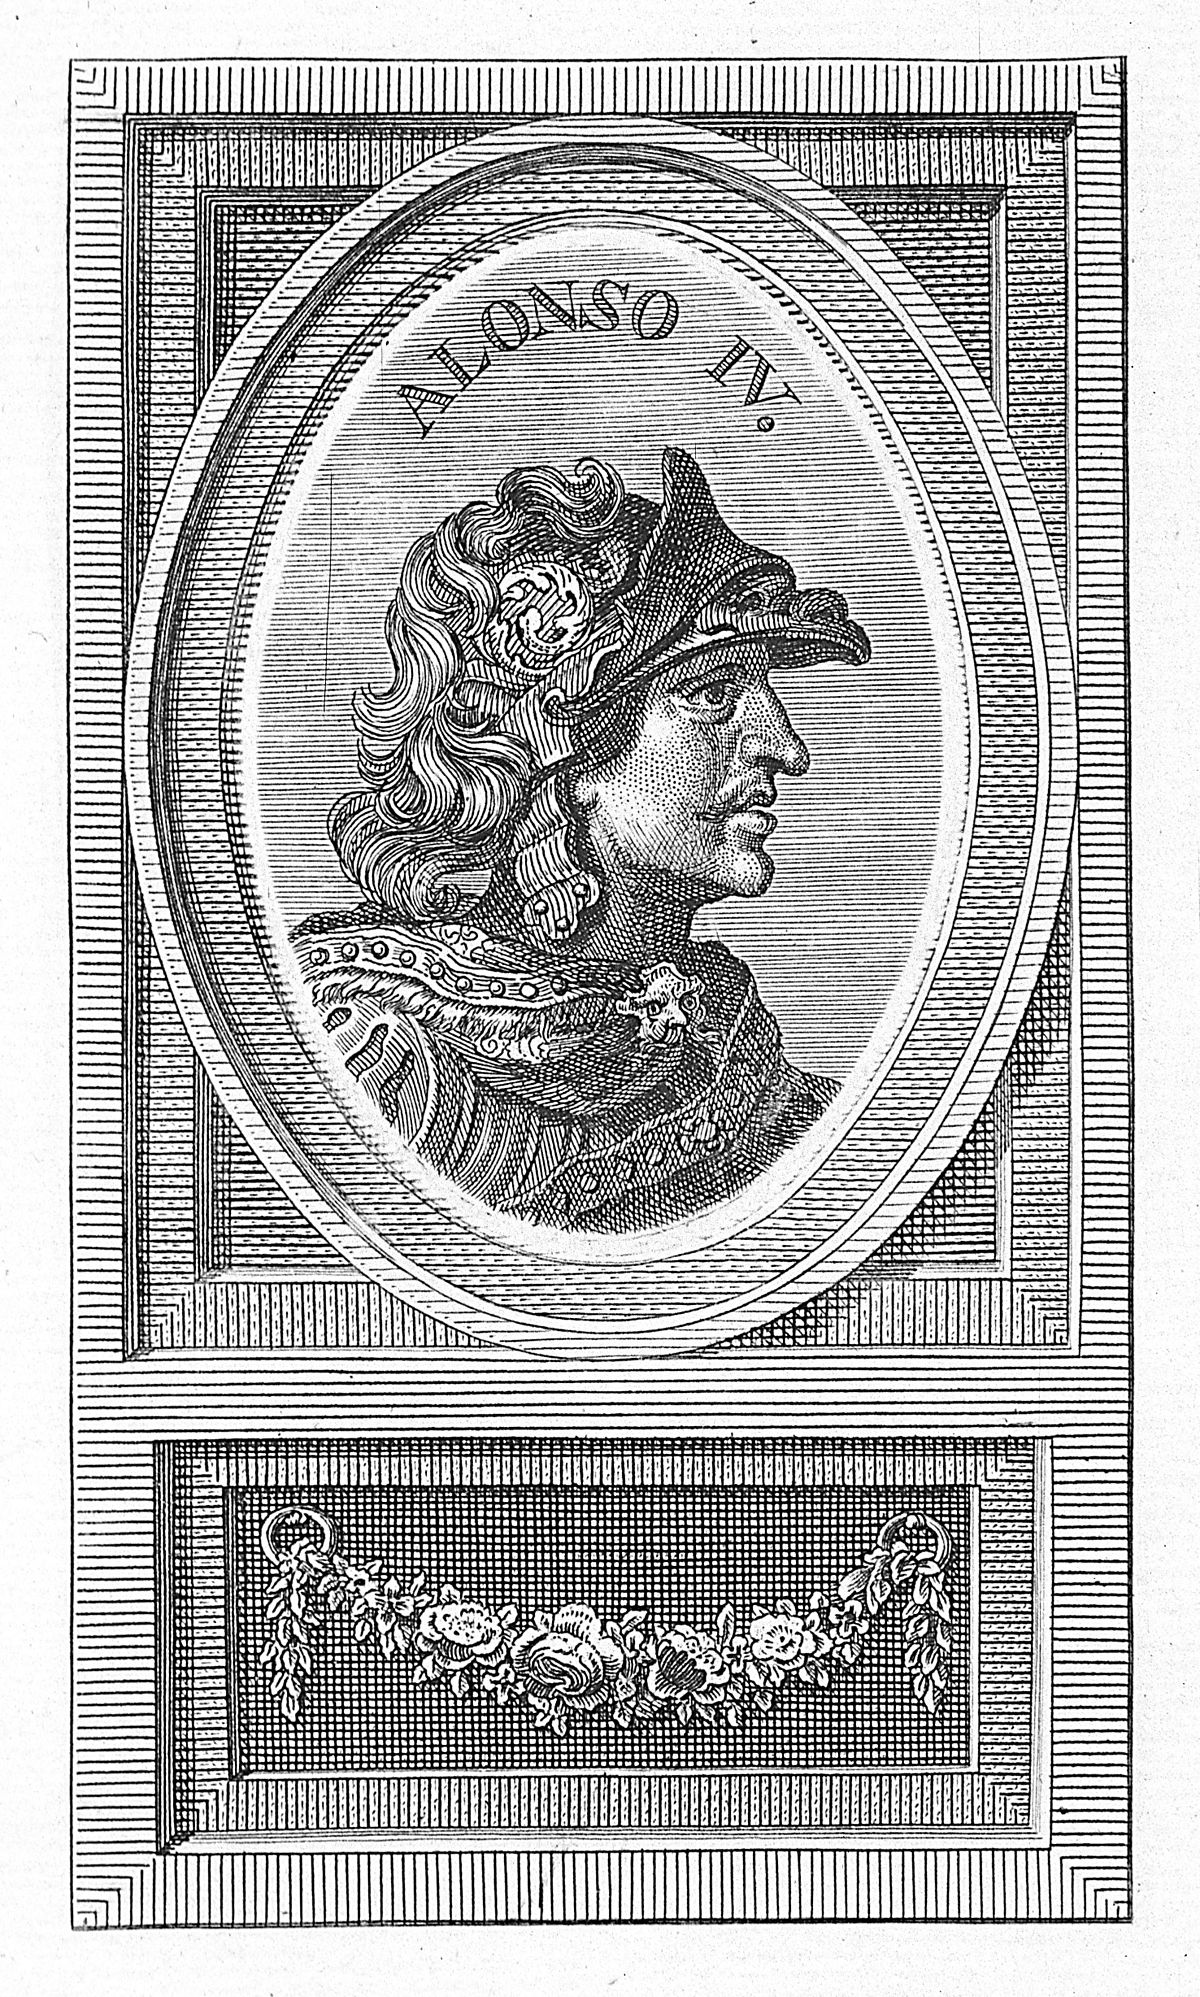 Reina de leon - 1 9